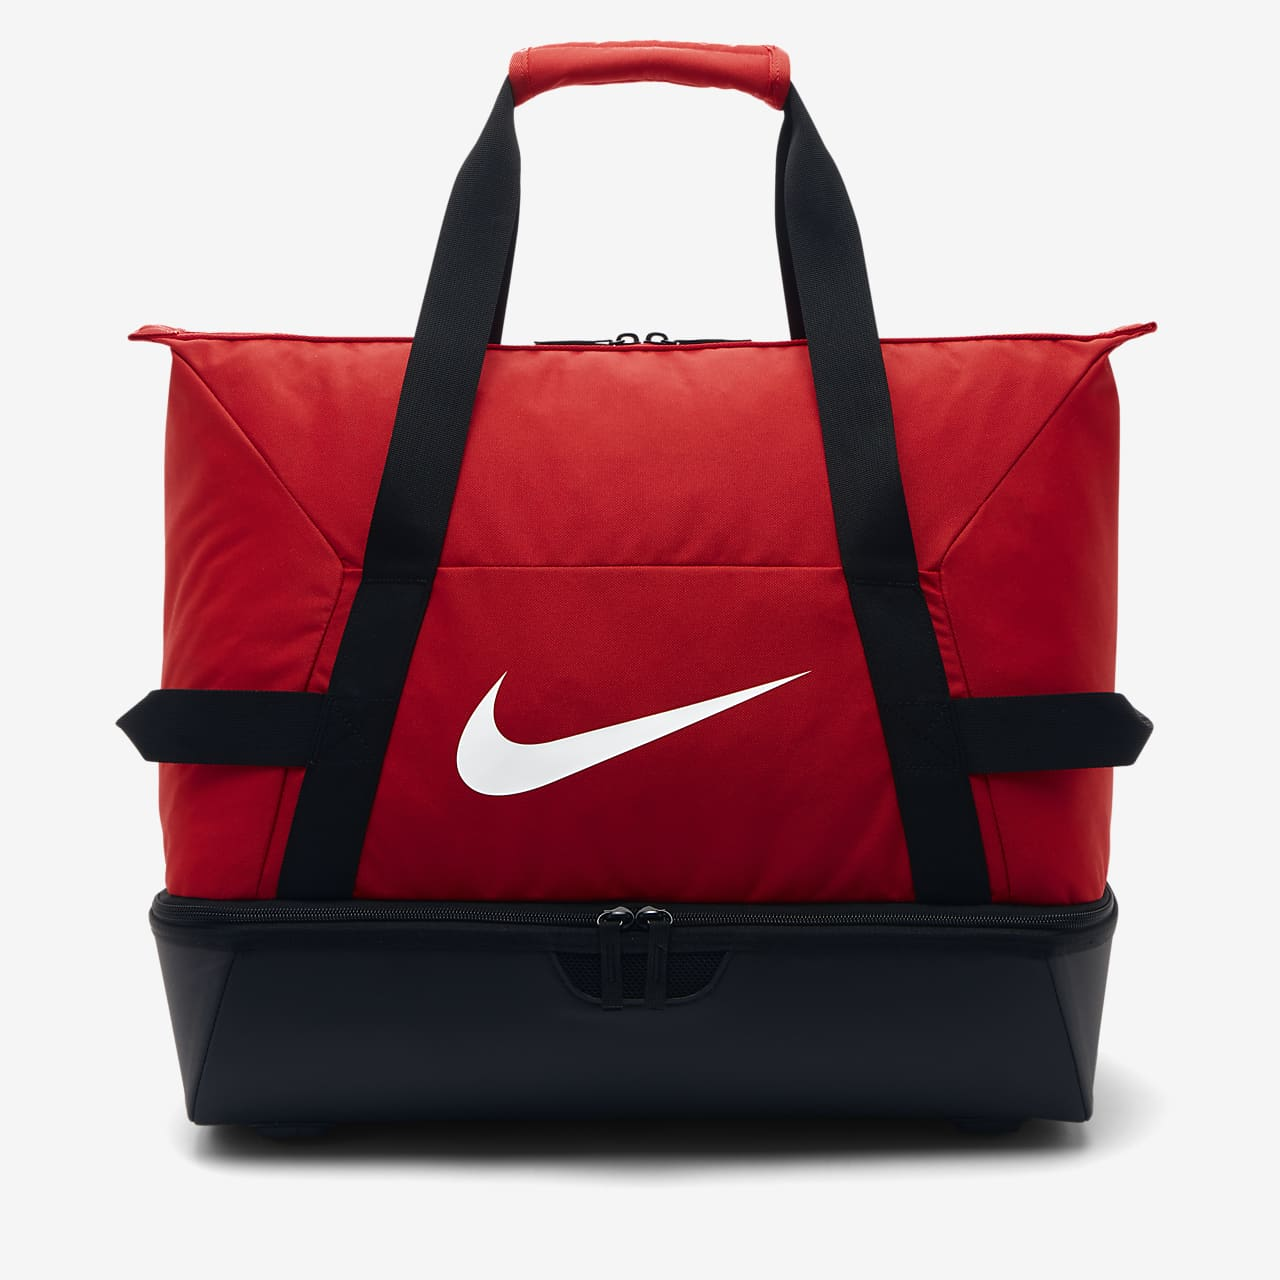 Nike Academy Team Hardcase (medium) duffelbag til fotball